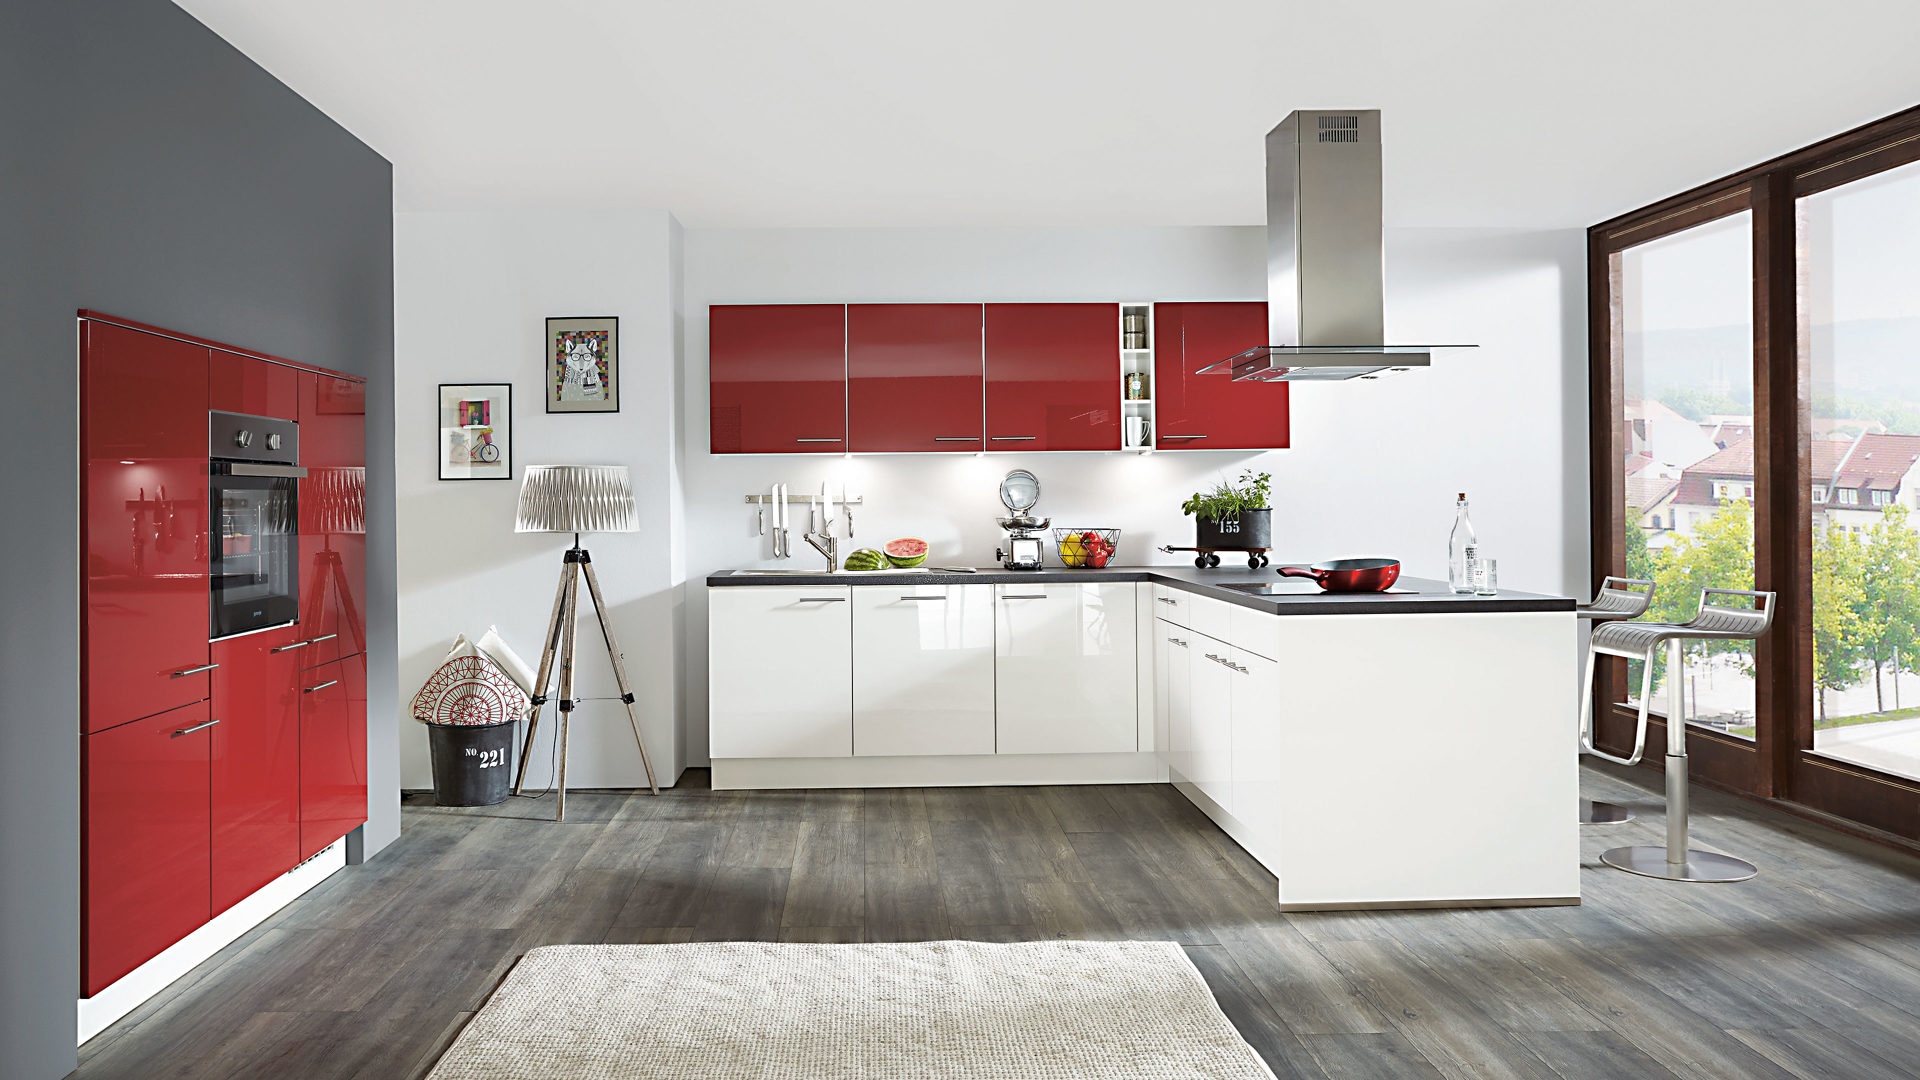 Möbel Boer Coesfeld Räume Küche Einbaugeräte Autarkes Aeg M?bel Boer ...